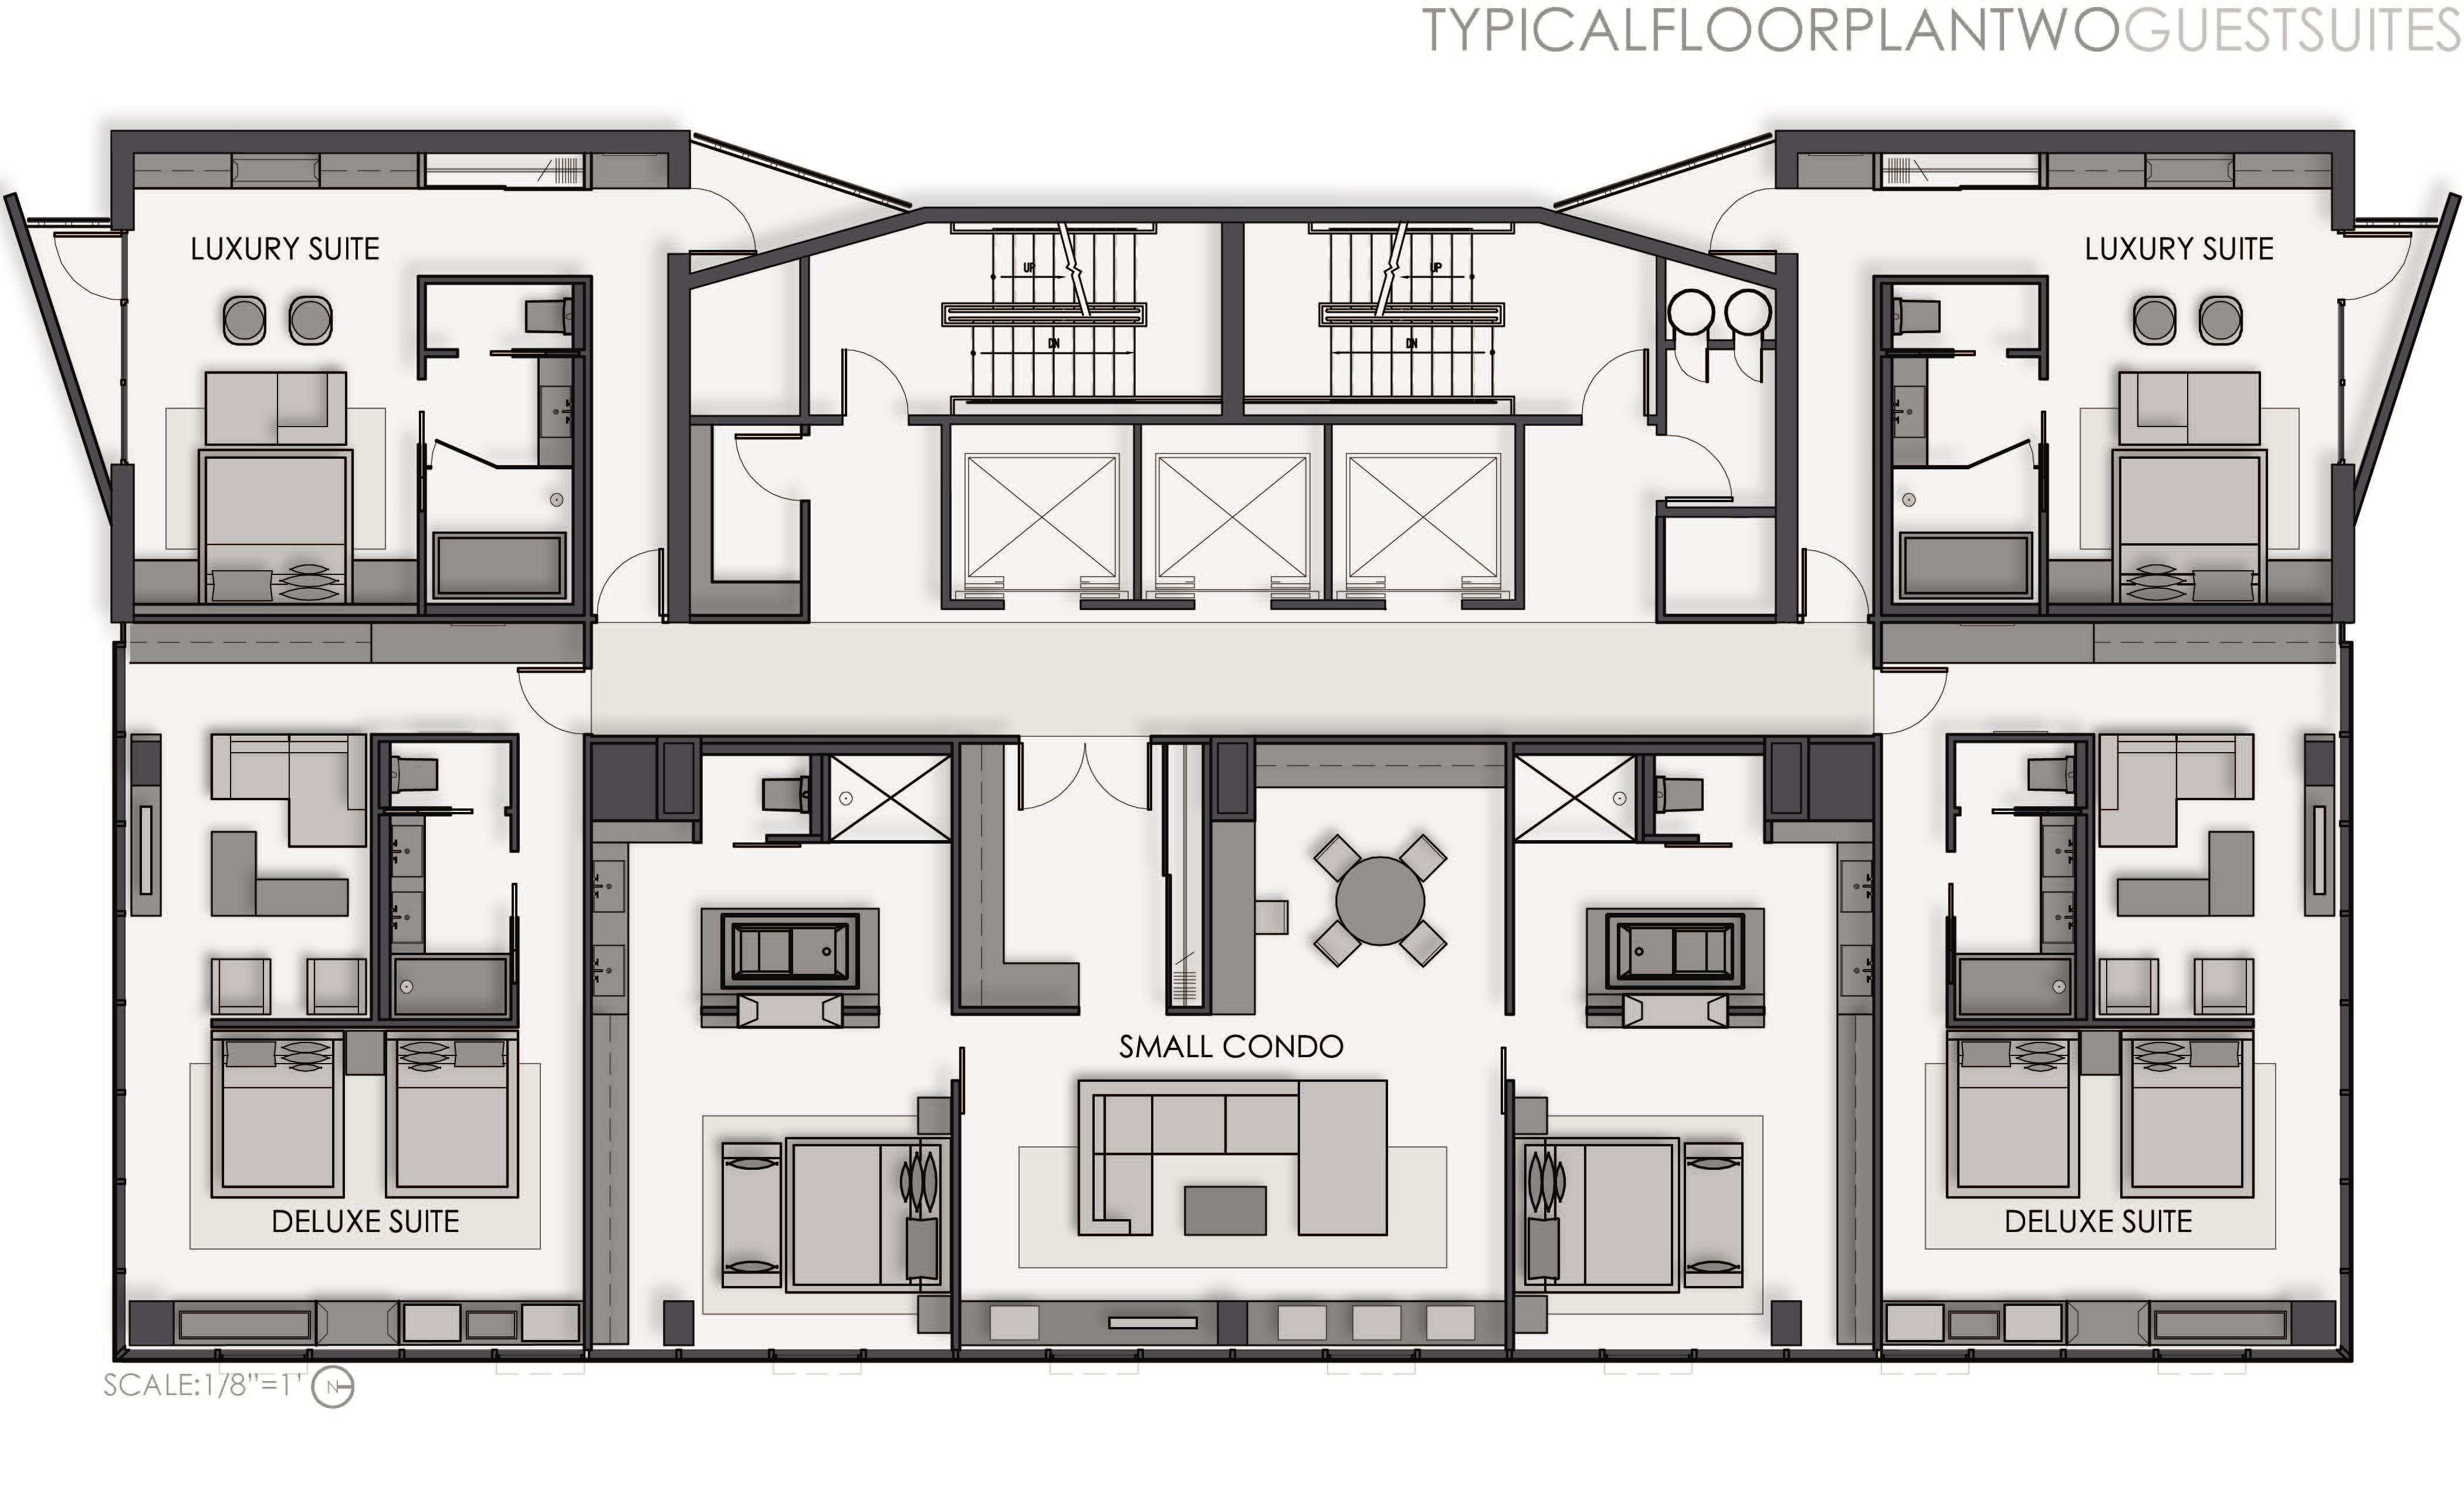 Hotel Floor Plan Design: A Boutique Hotel By Shelley Quinn At Coroflot.com